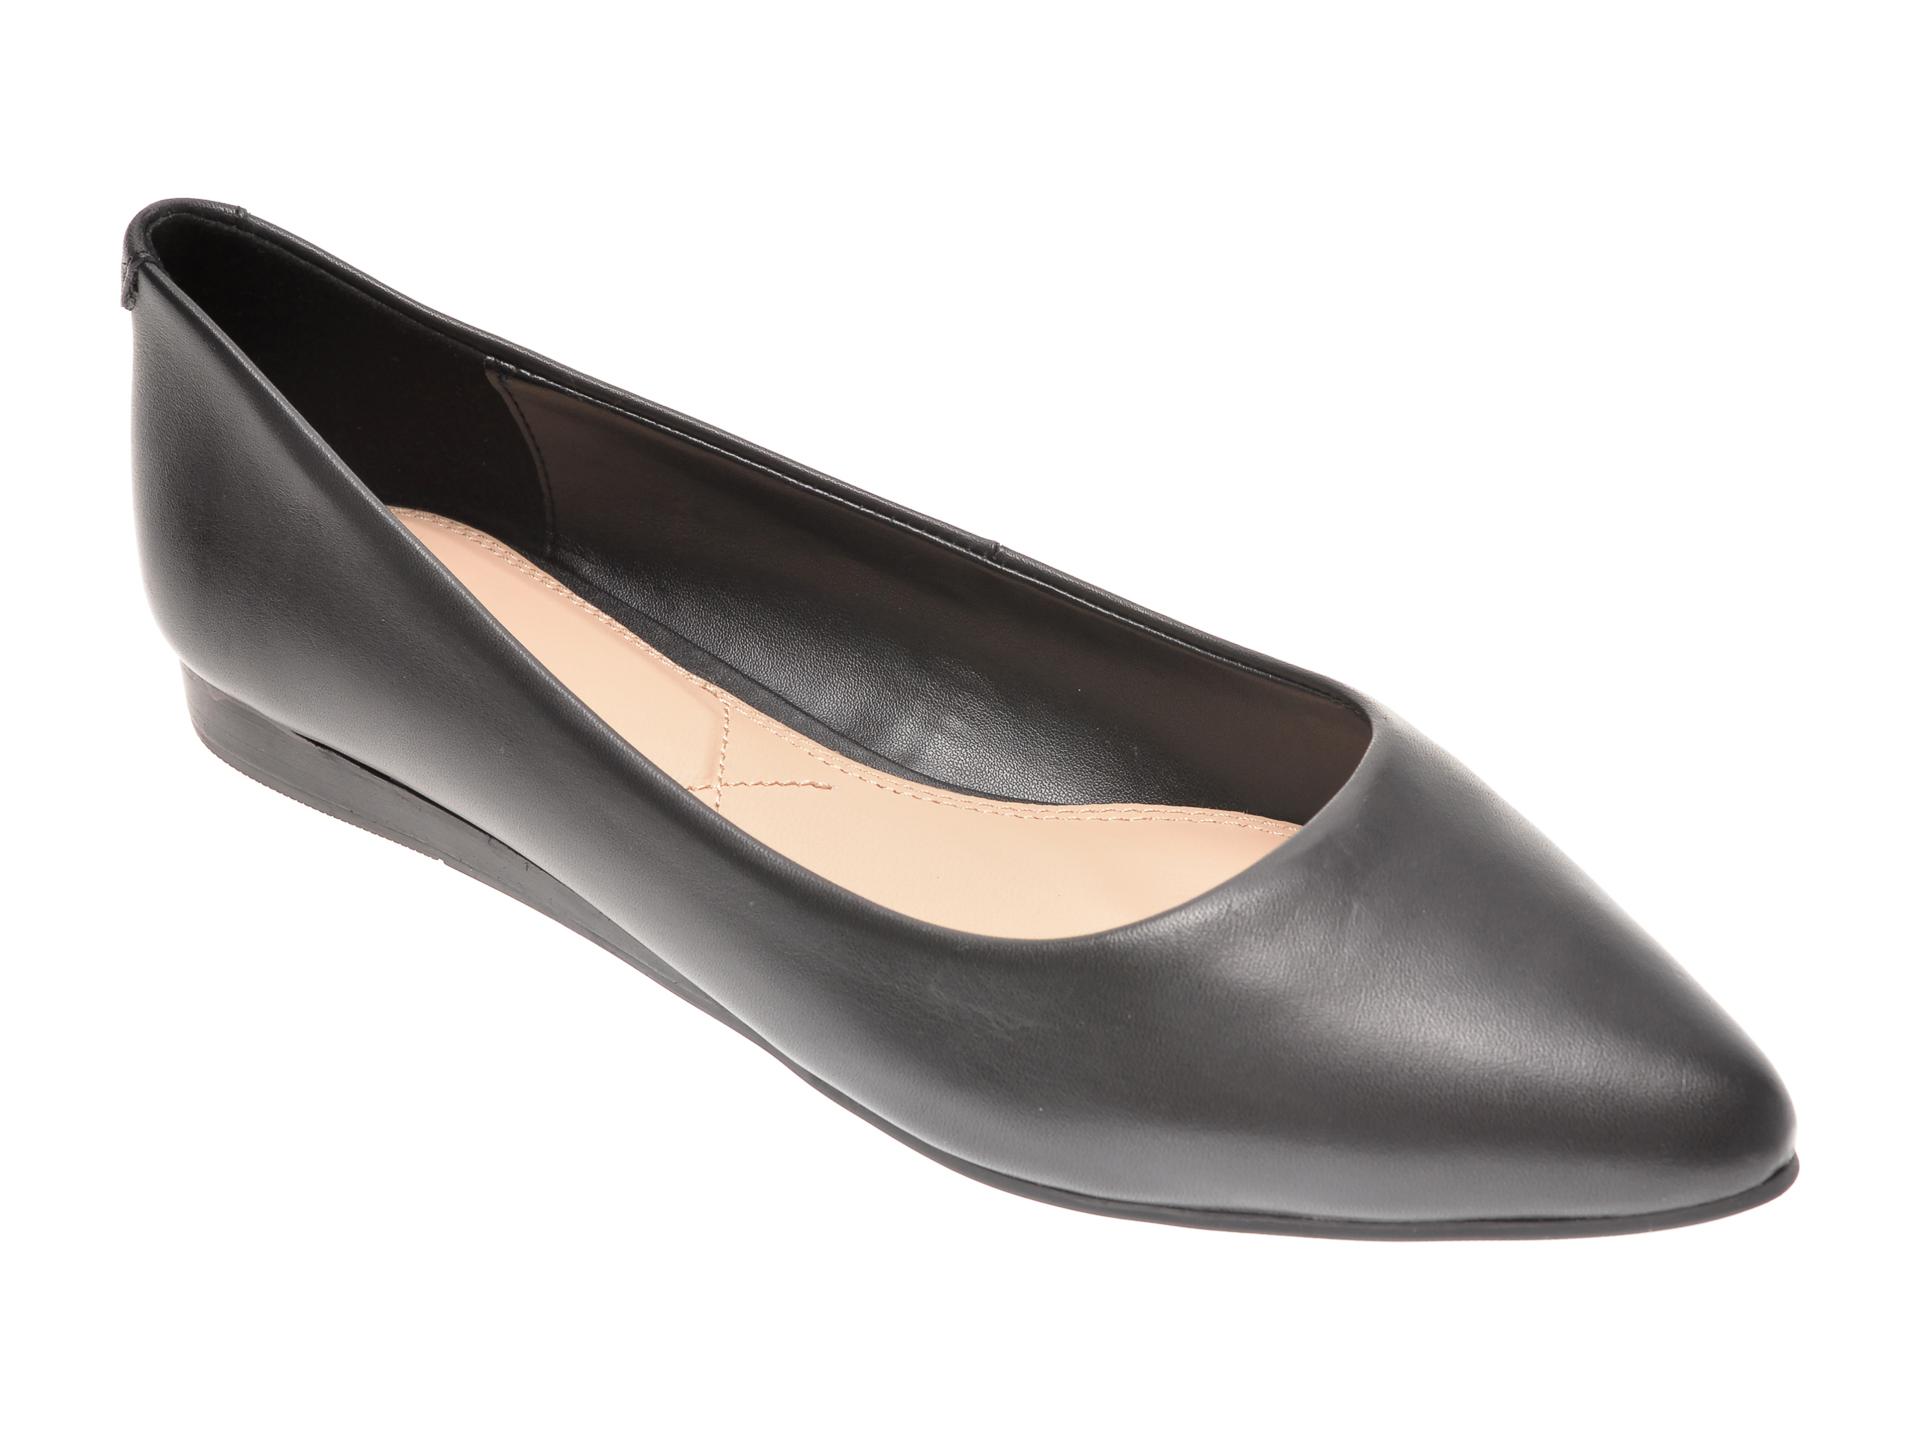 Pantofi Aldo Negri, Zareni001, Din Piele Naturala